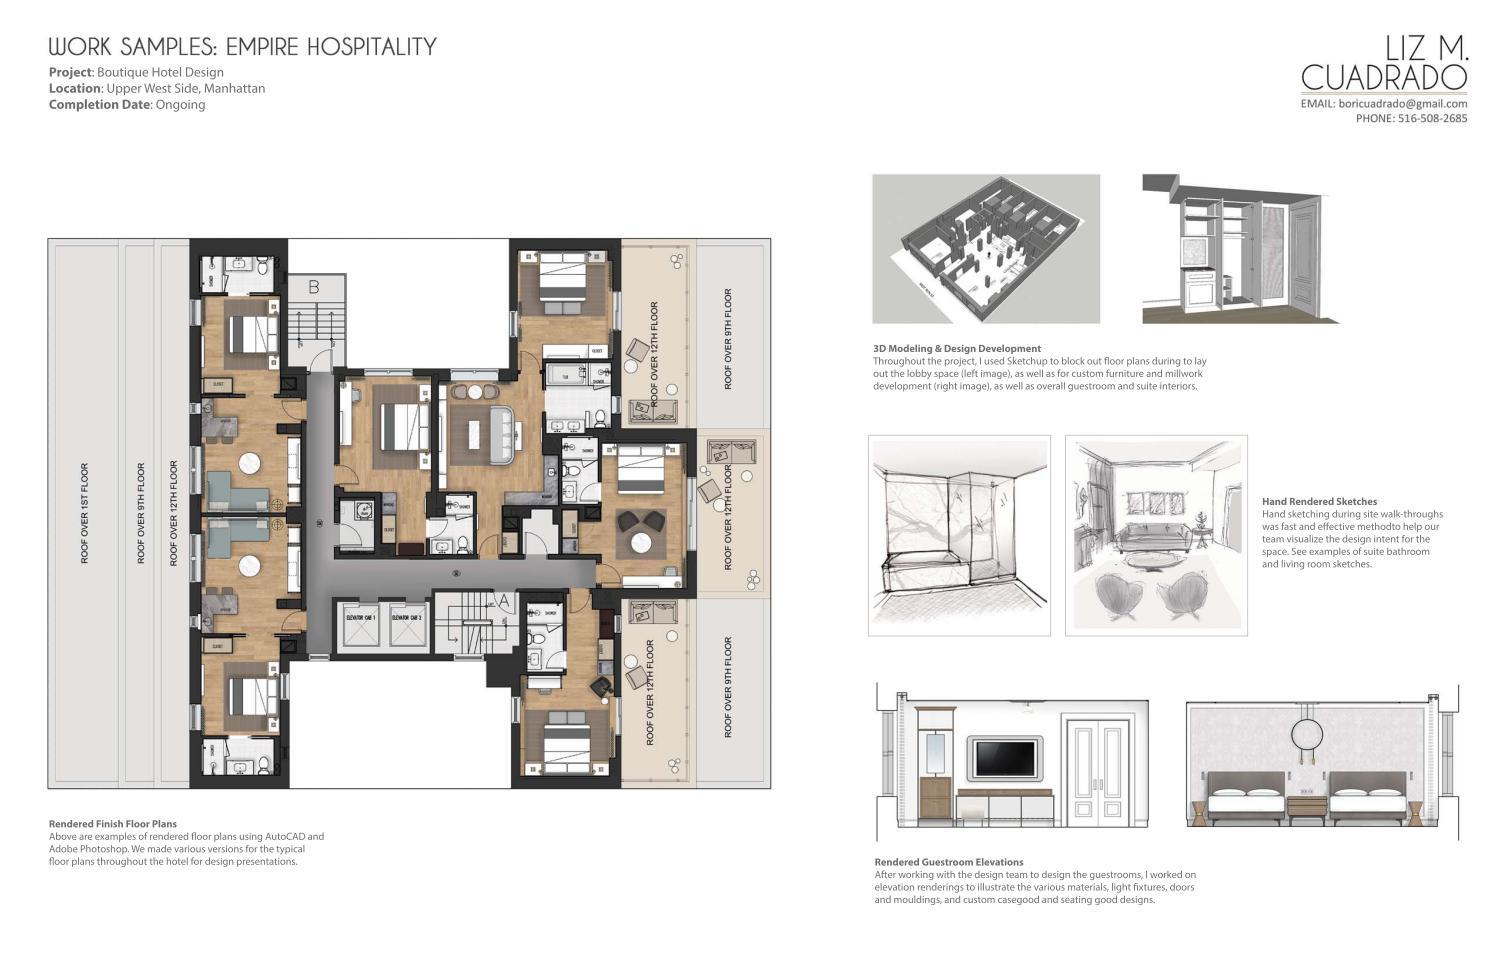 Interior Design Portfolio Sample By Liz Cuadrado Issuu